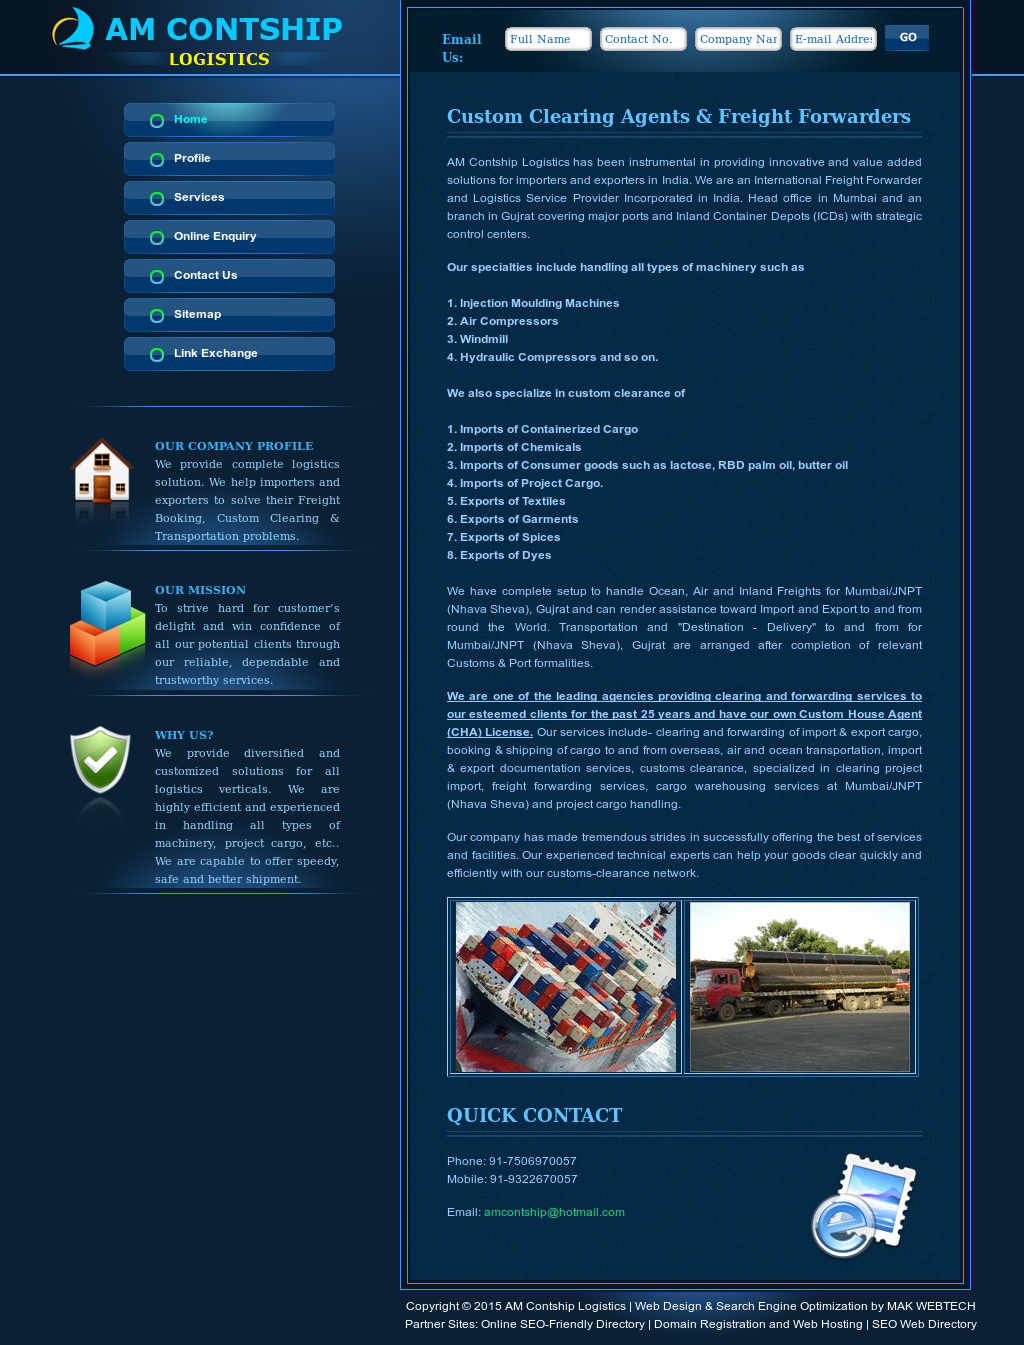 Am Contship Logistics Competitors, Revenue and Employees